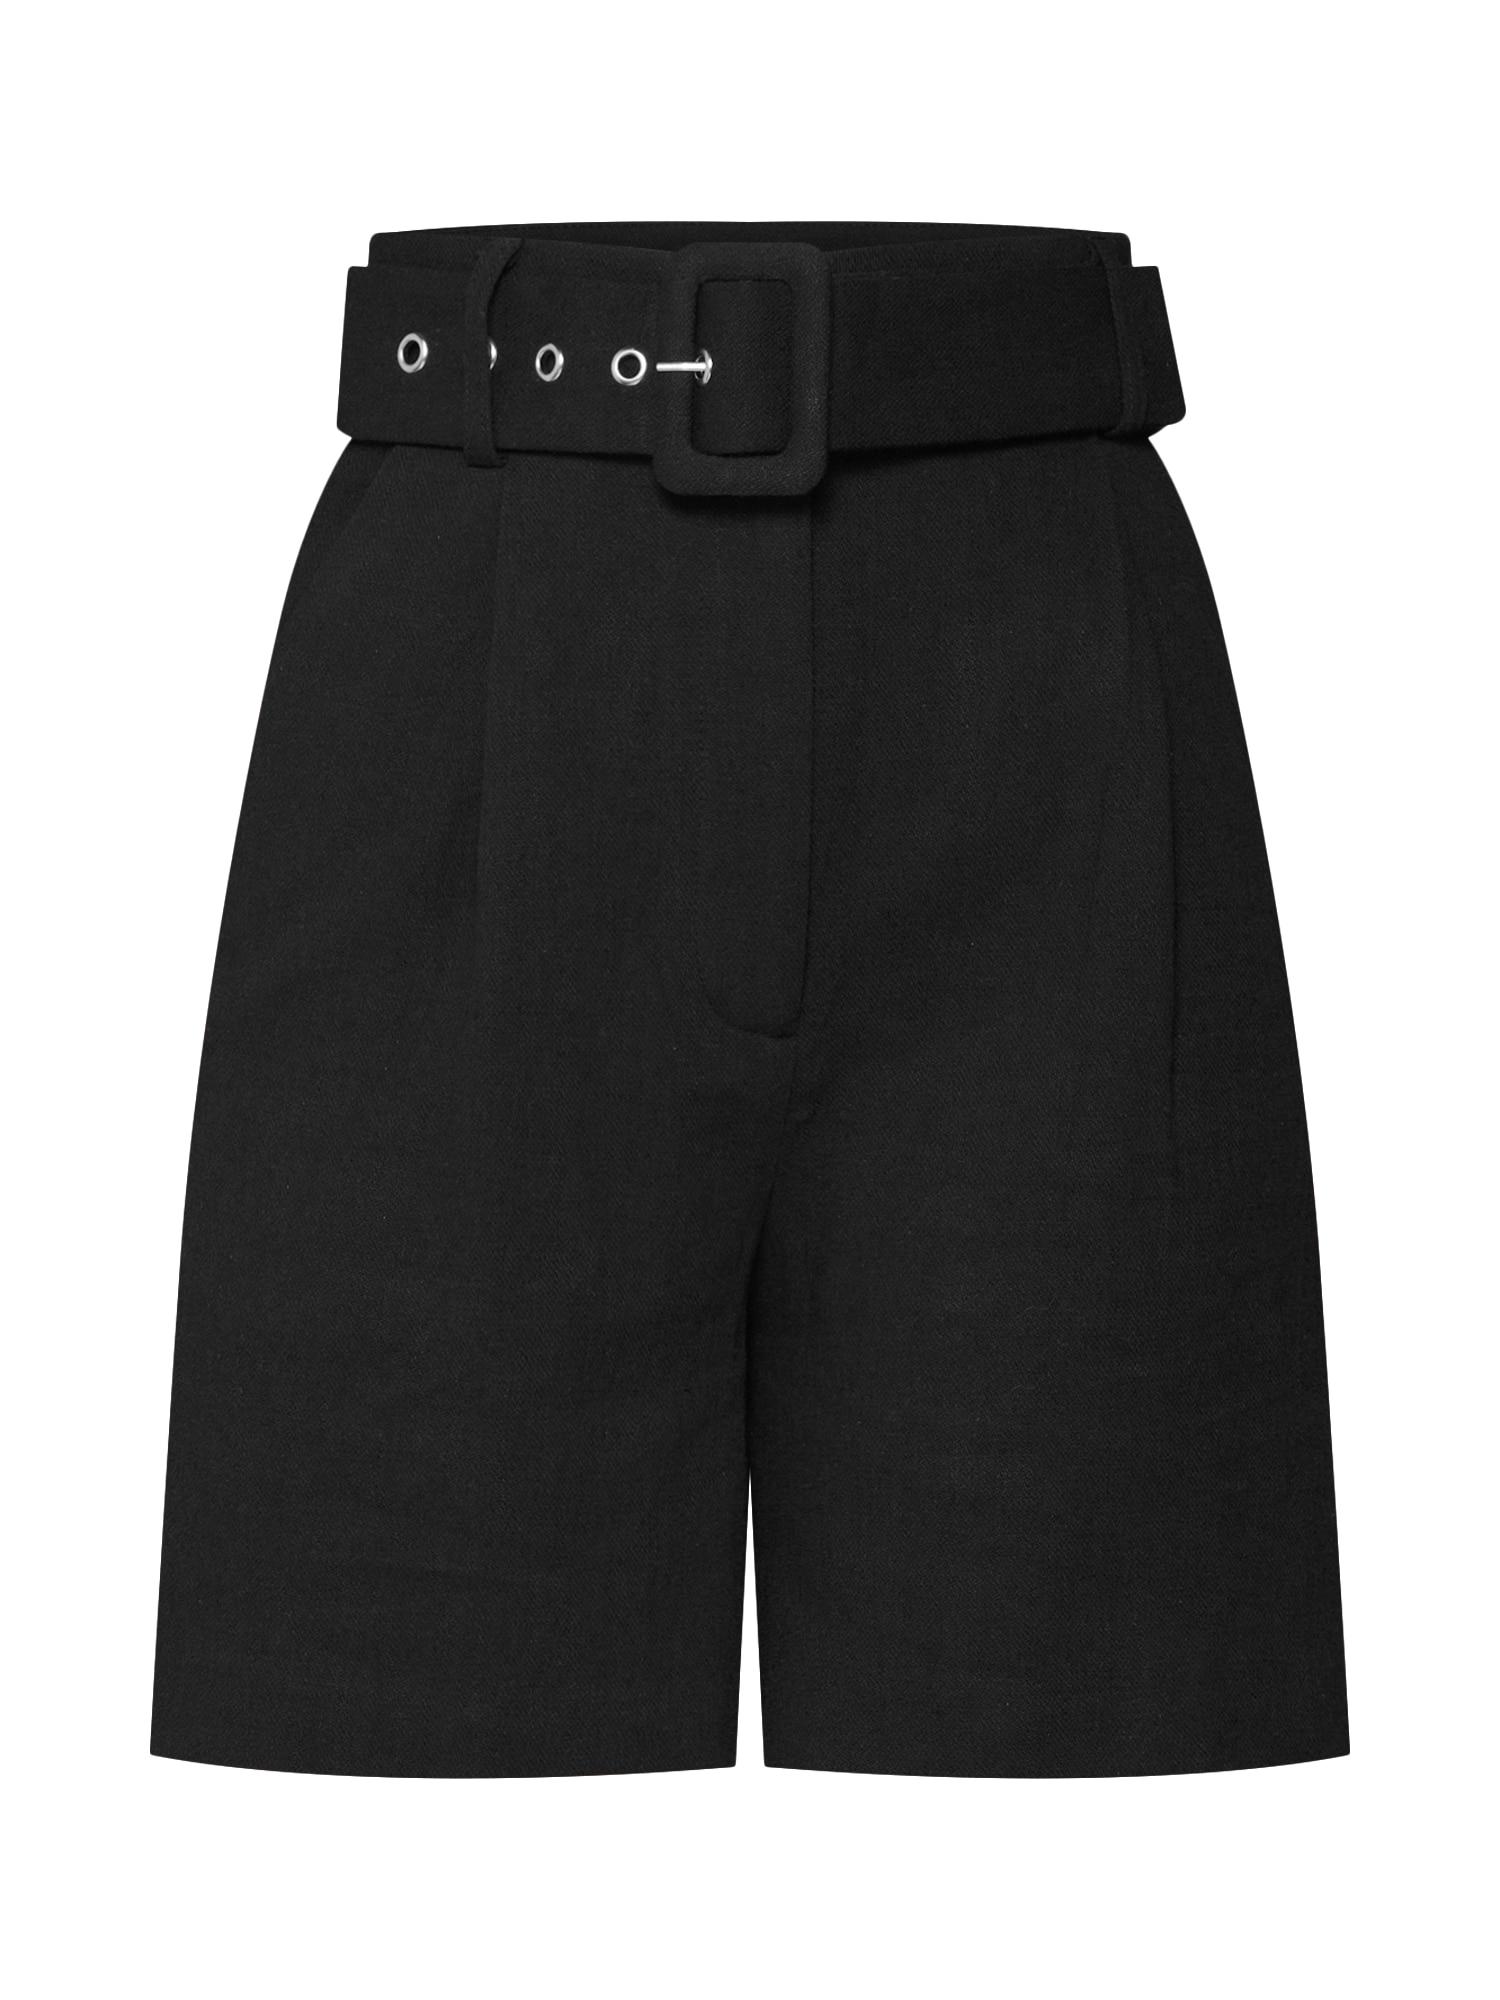 EDITED Klostuotos kelnės 'Faye' juoda